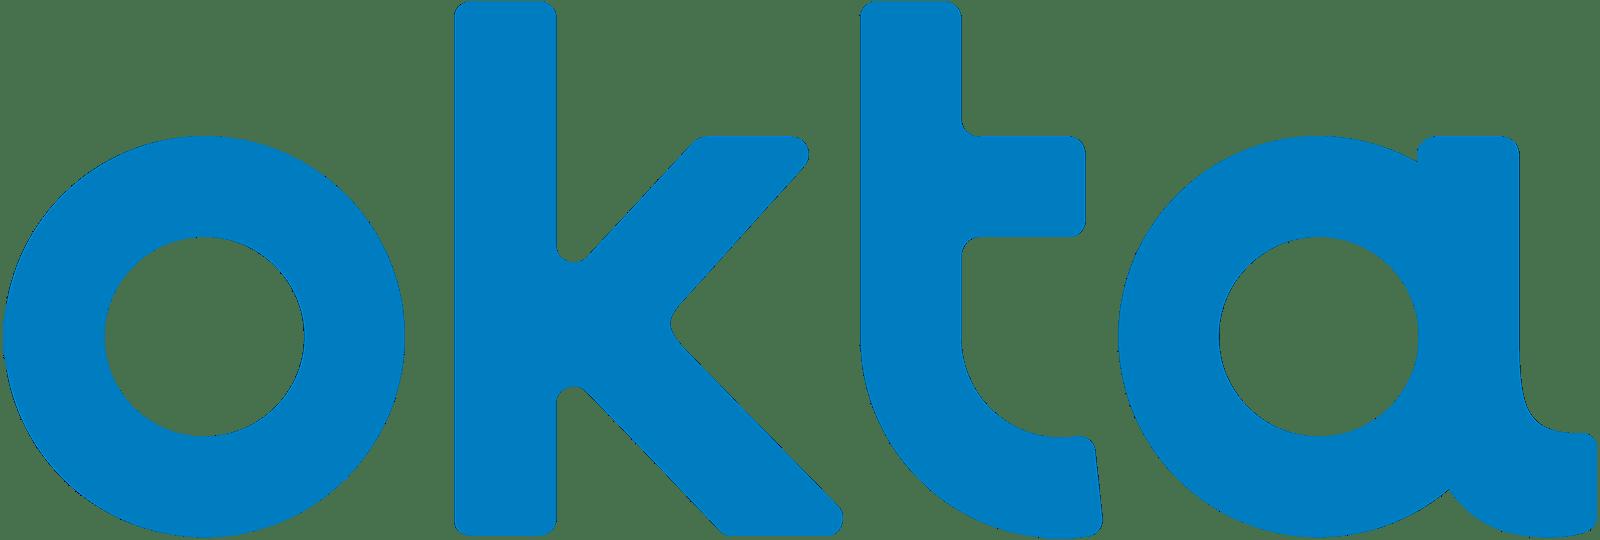 Connect Okta to the 1Password SCIM bridge